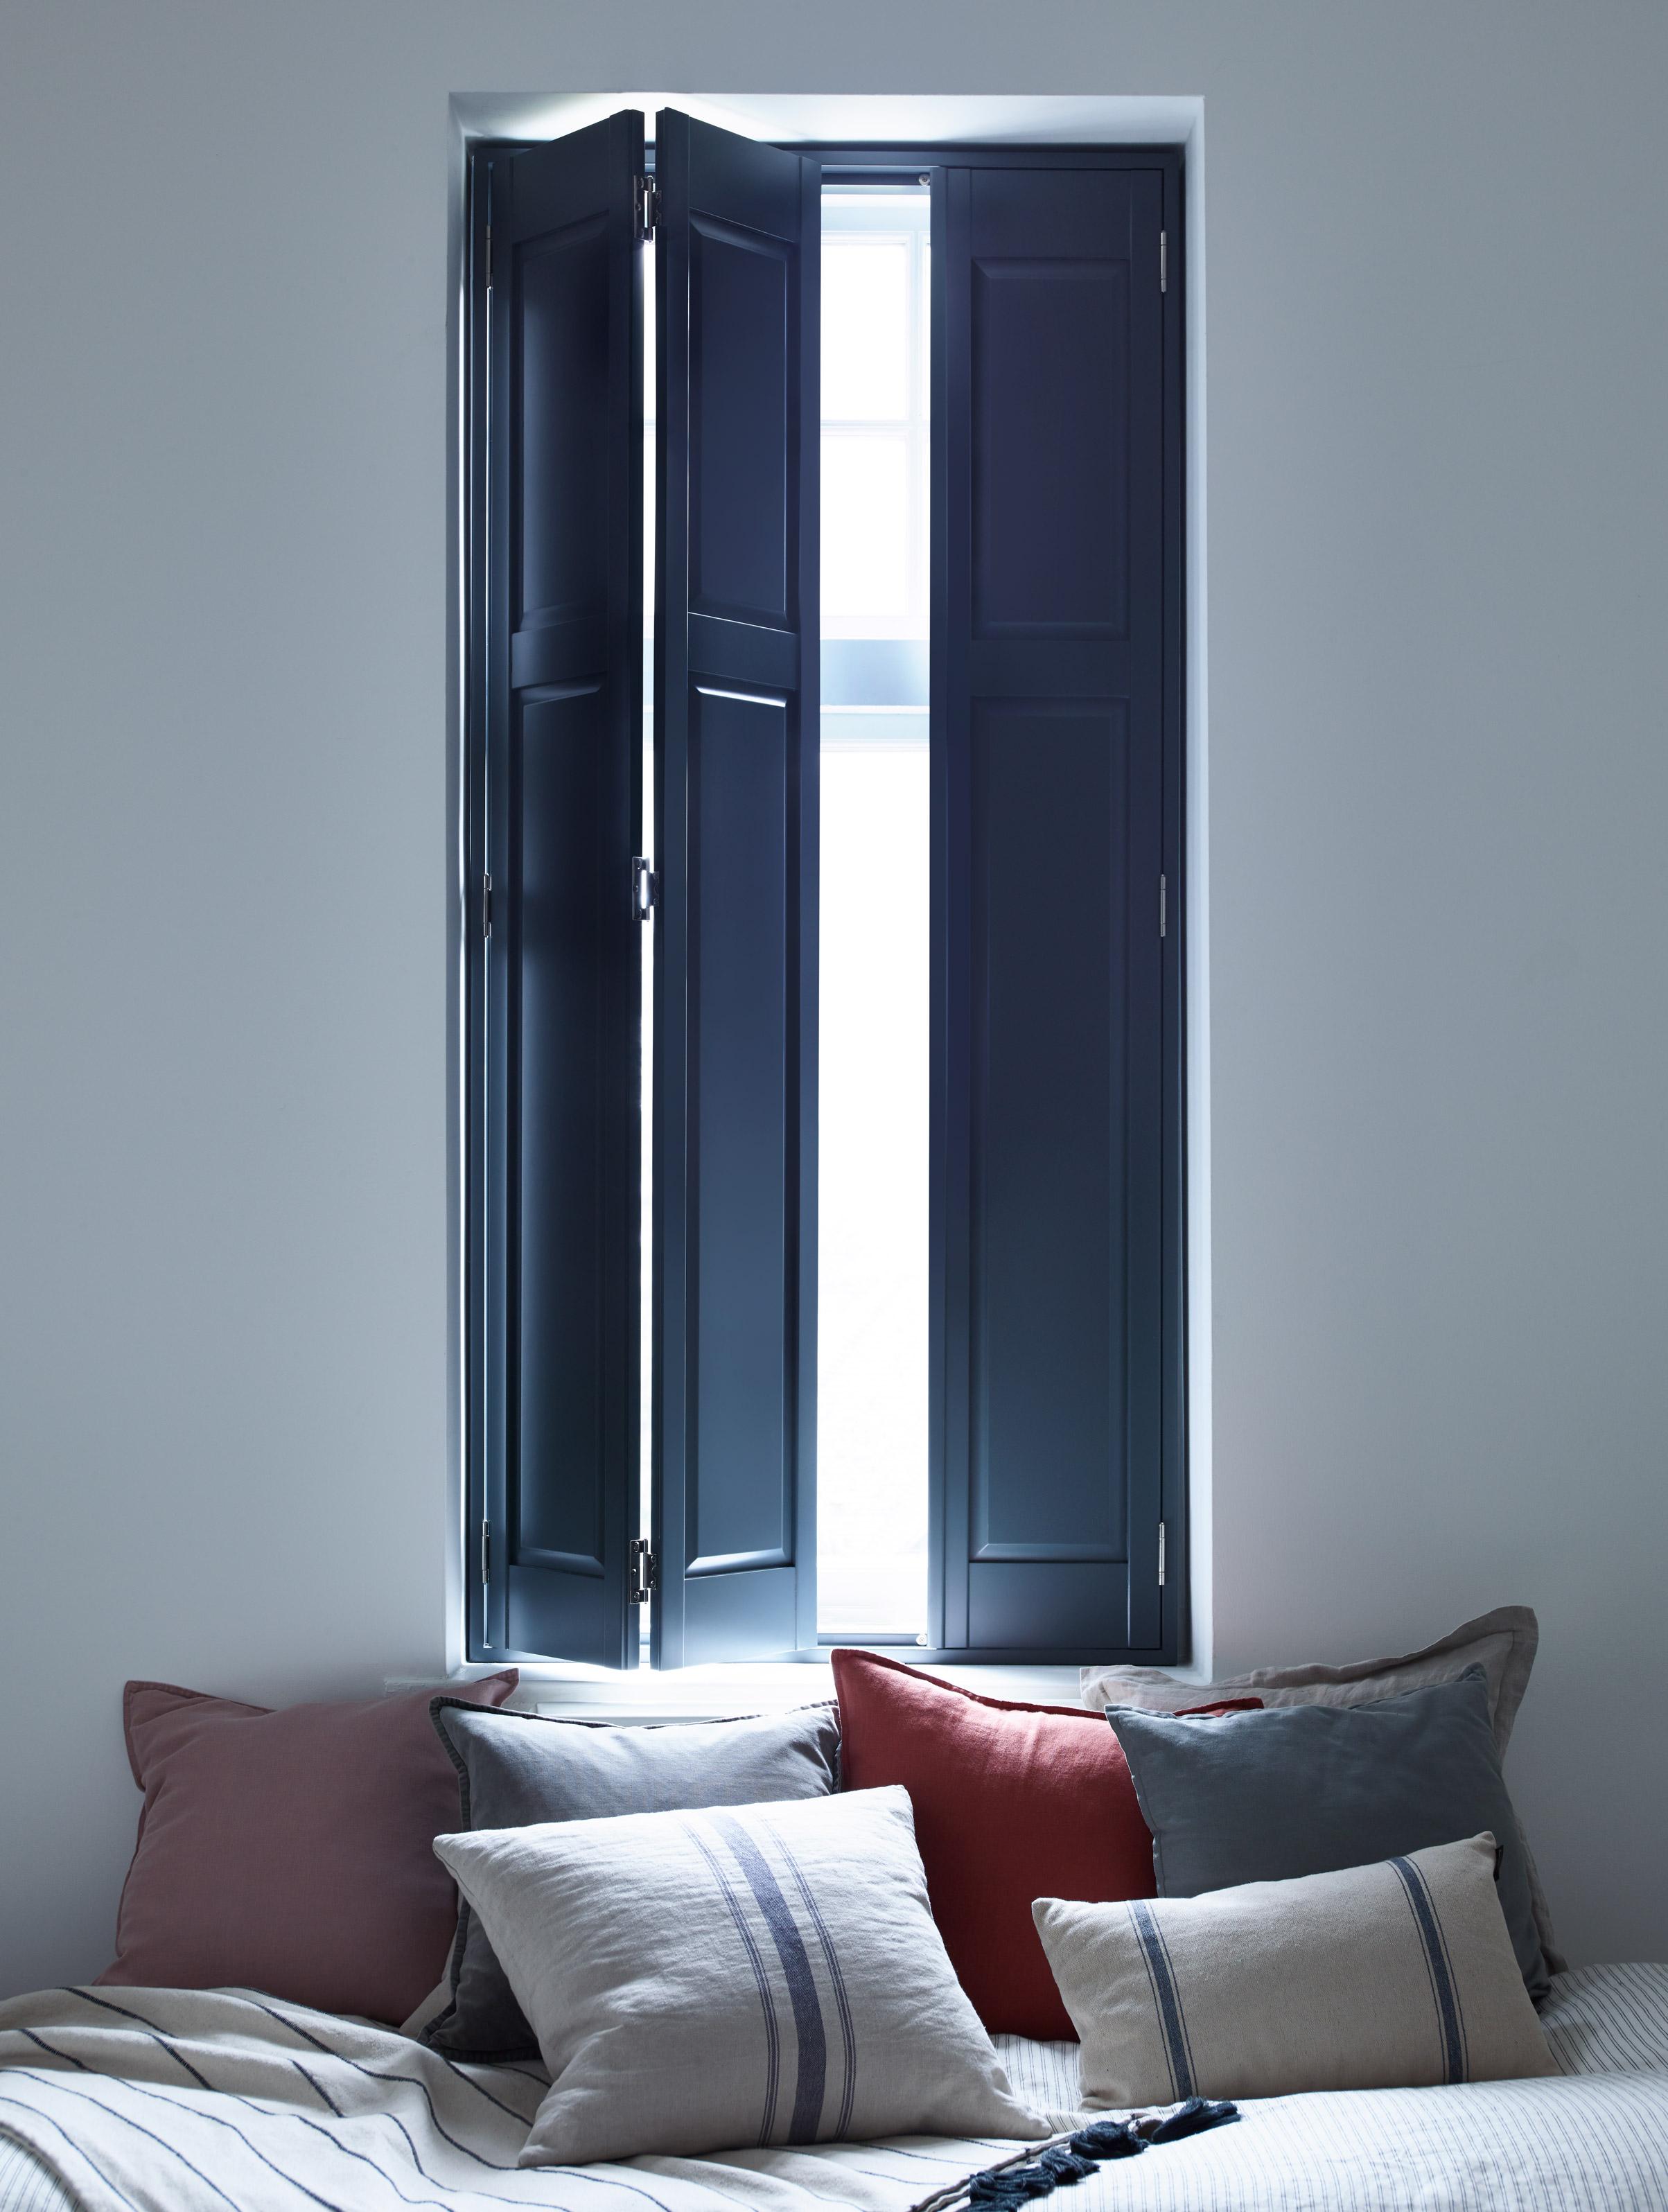 Blue Full solid raised poplar wood shutters for bedroom